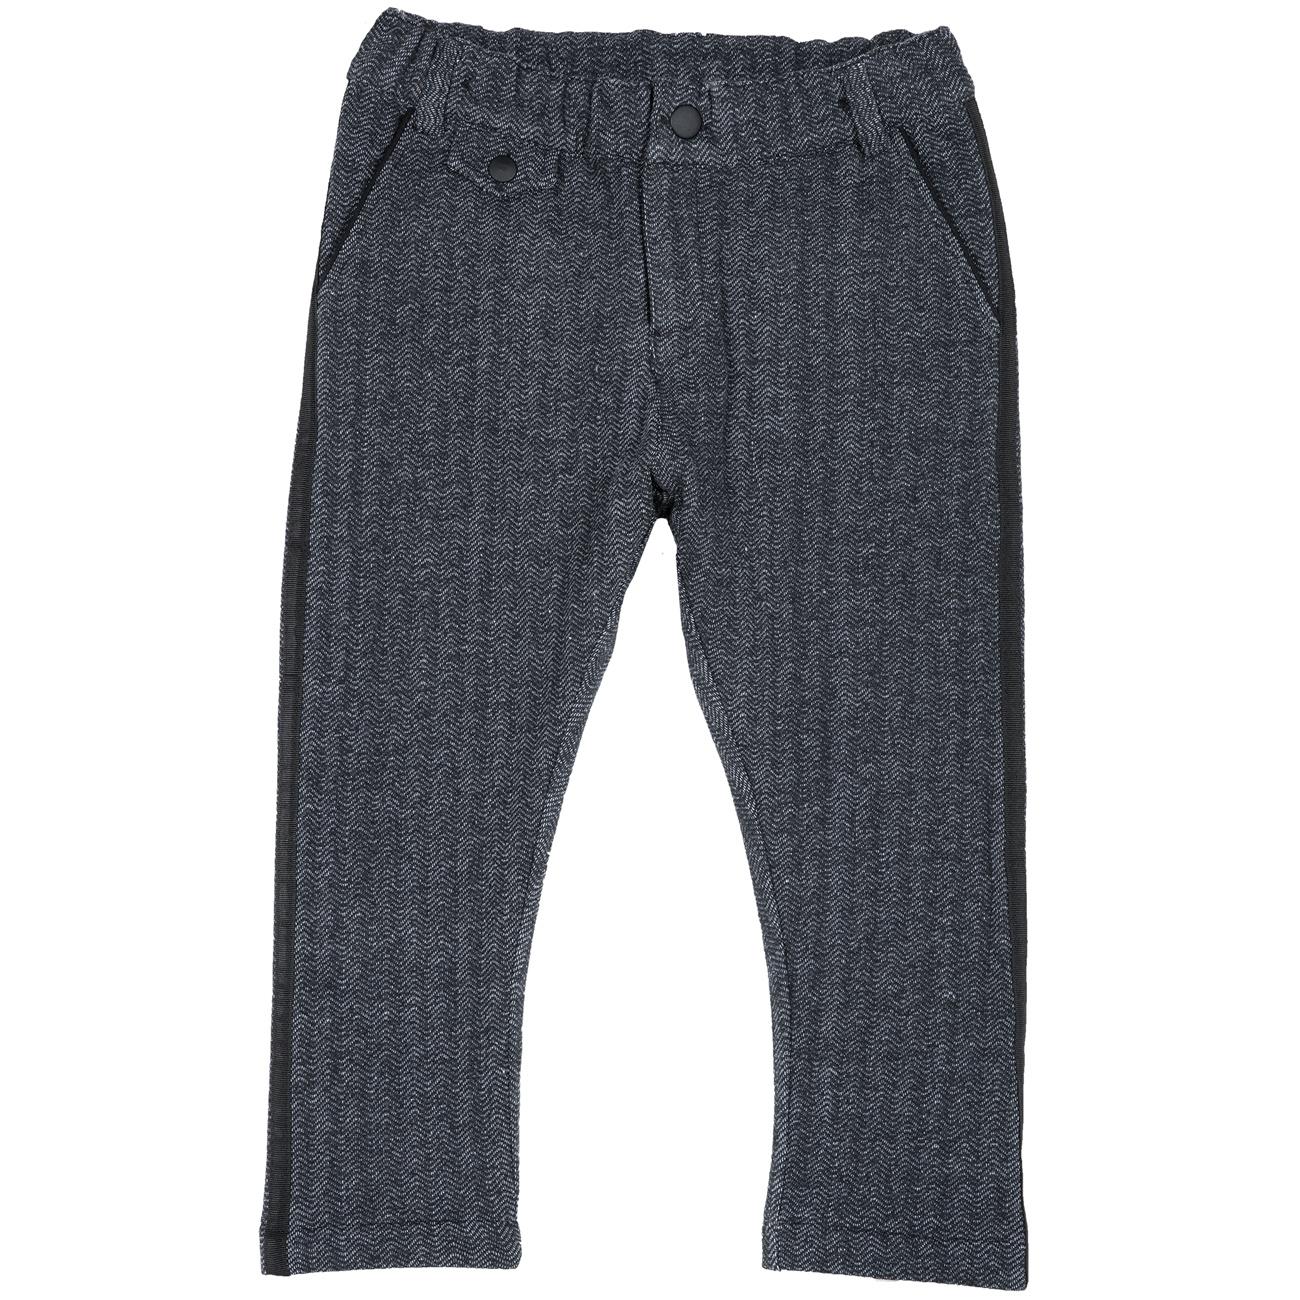 Pantalon copii Chicco, negru